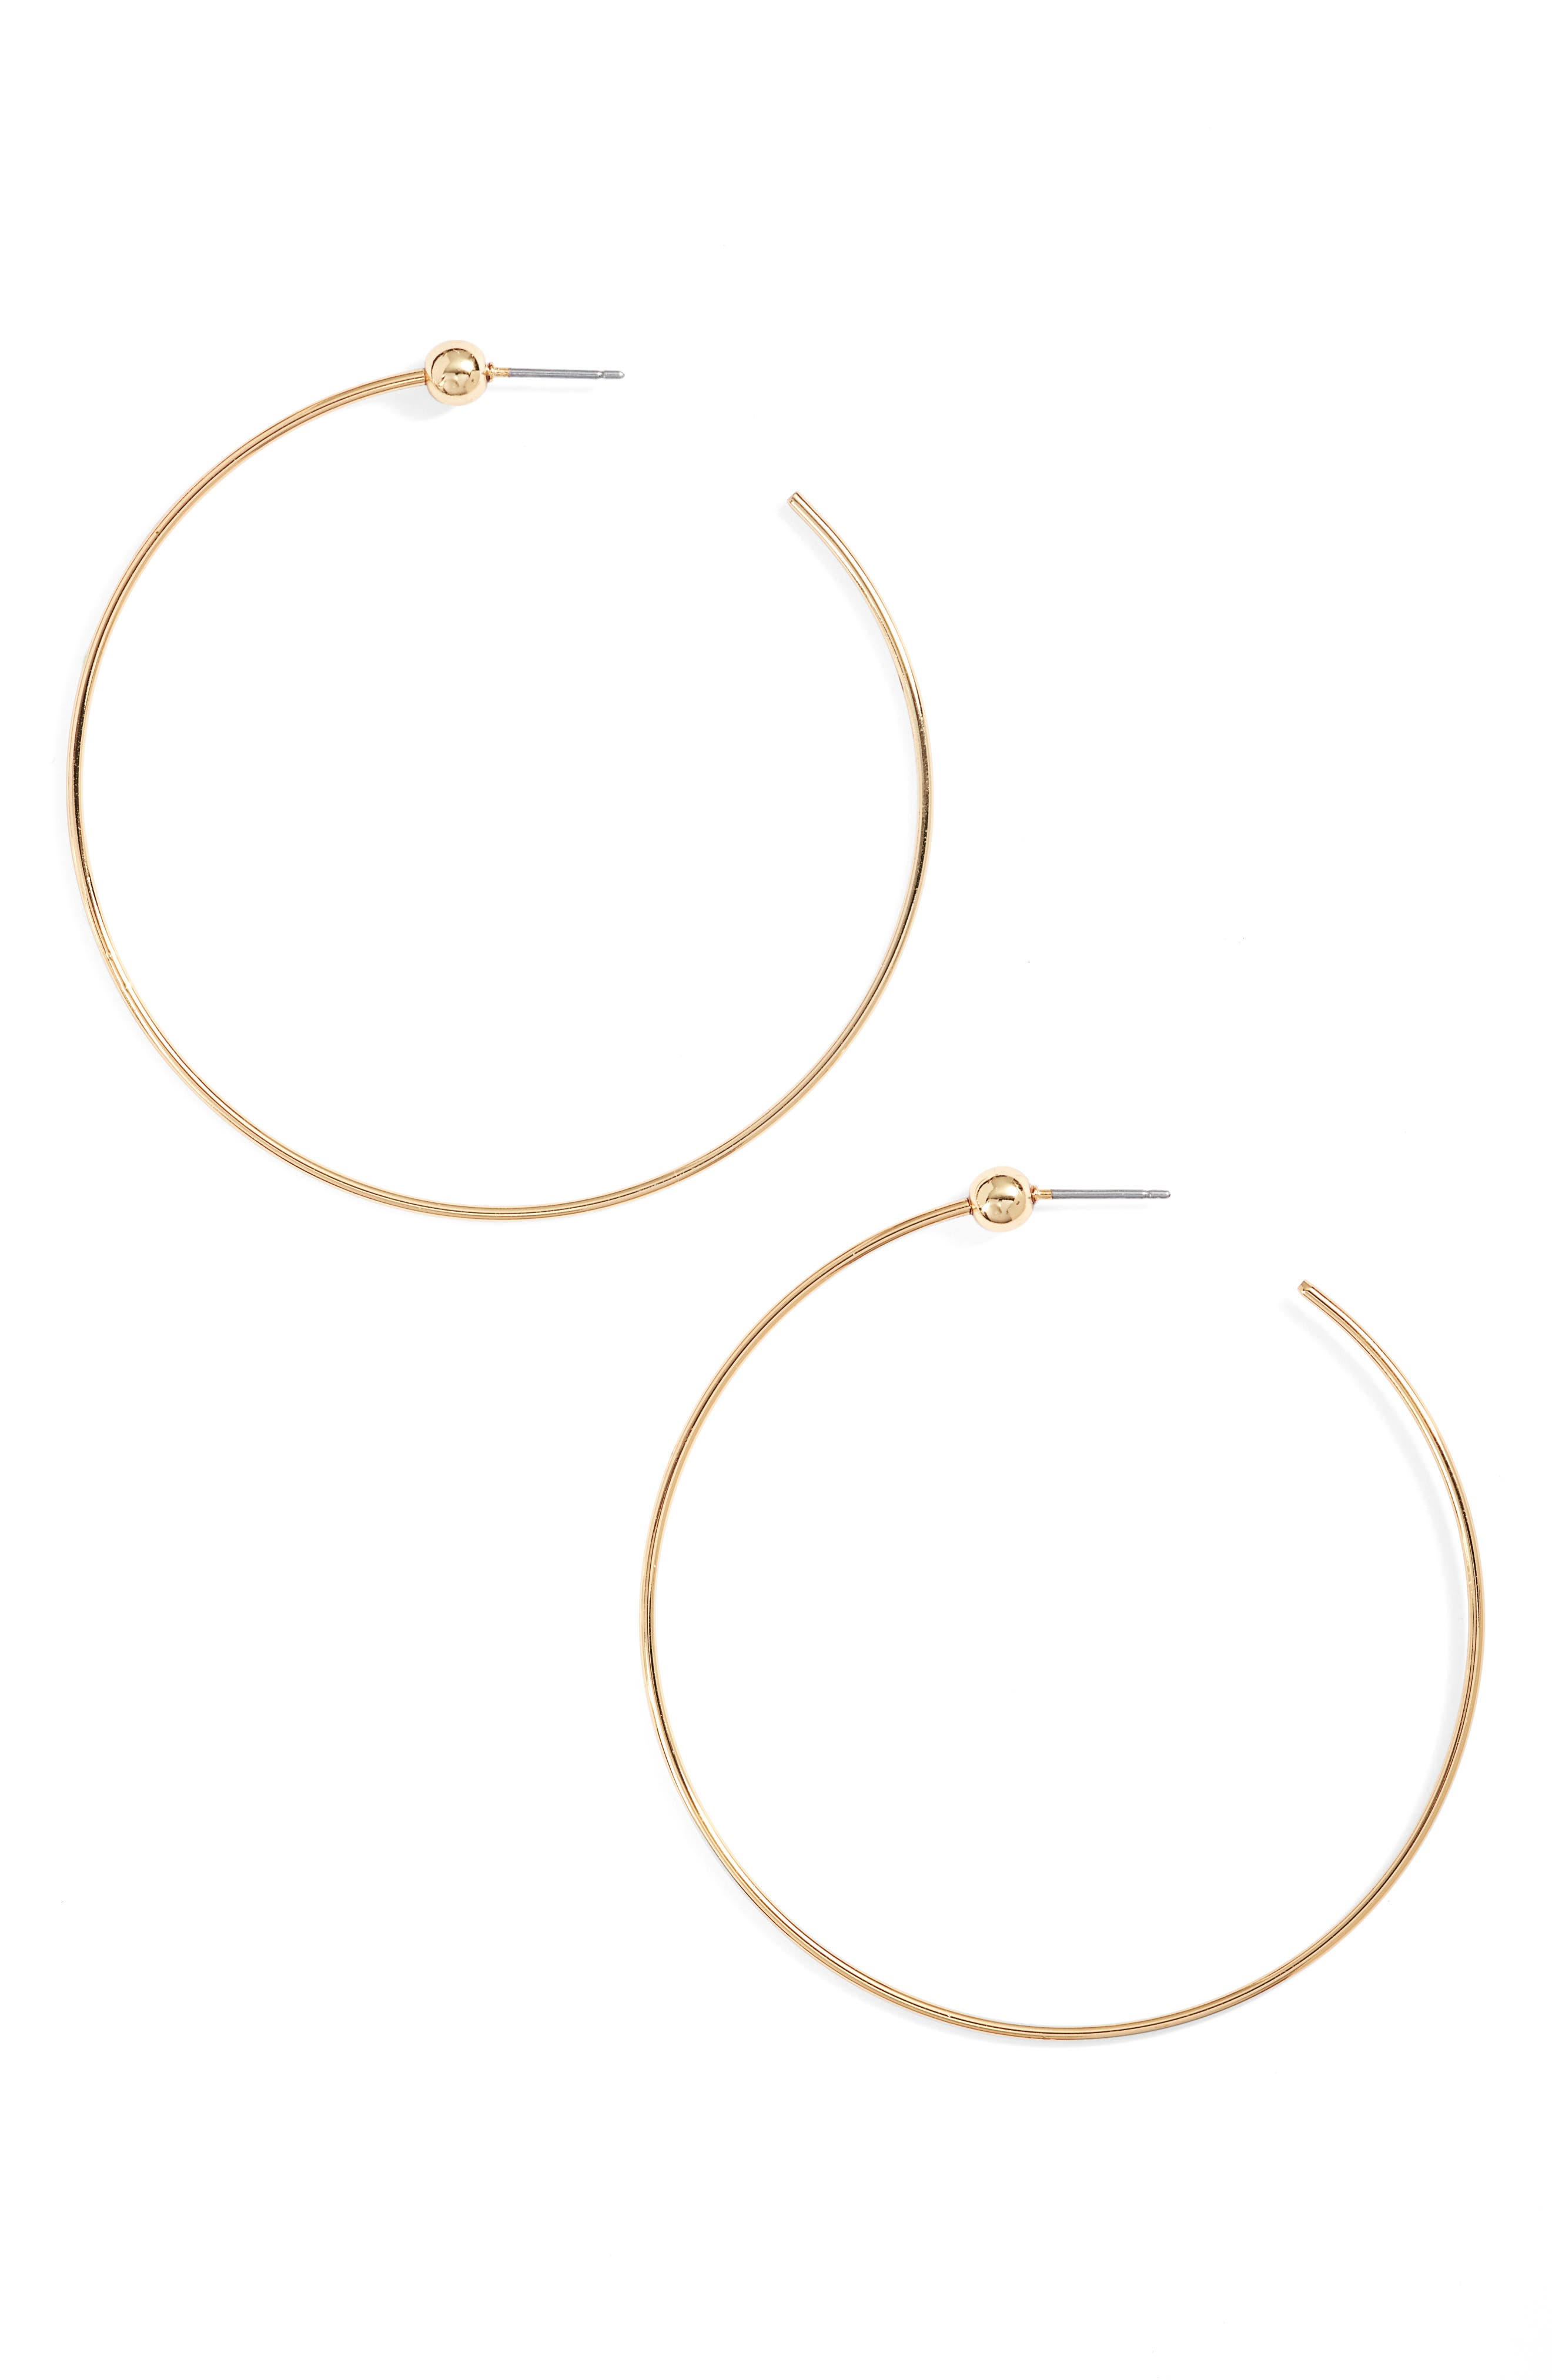 Alternate Image 1 Selected - Jenny Bird Medium Hoop Earrings